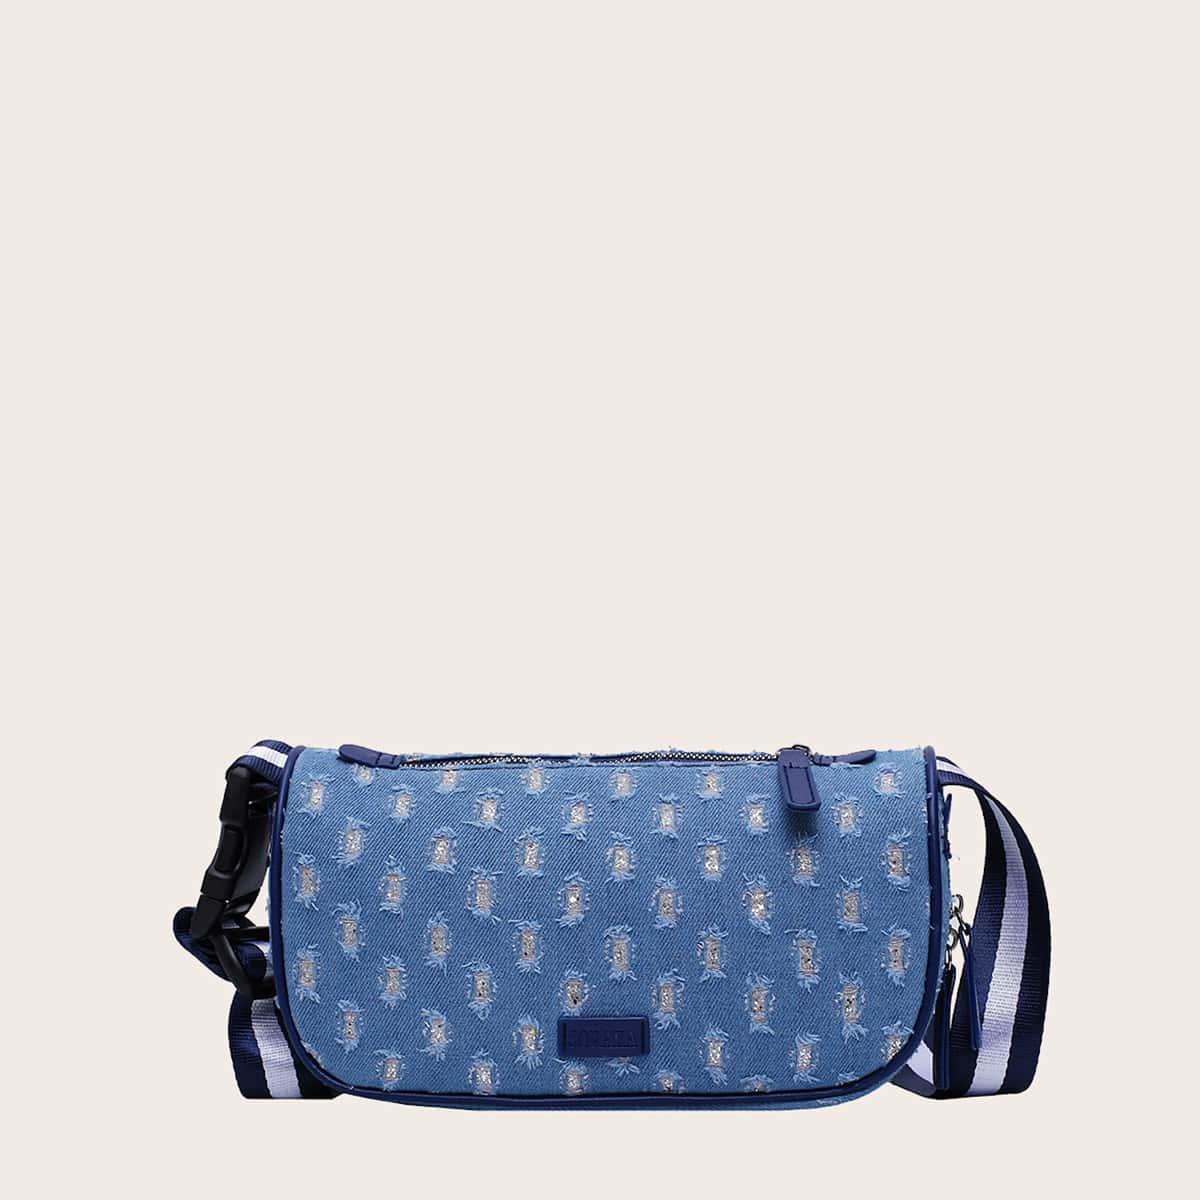 Bolsa bandolera con diseño crudo denim